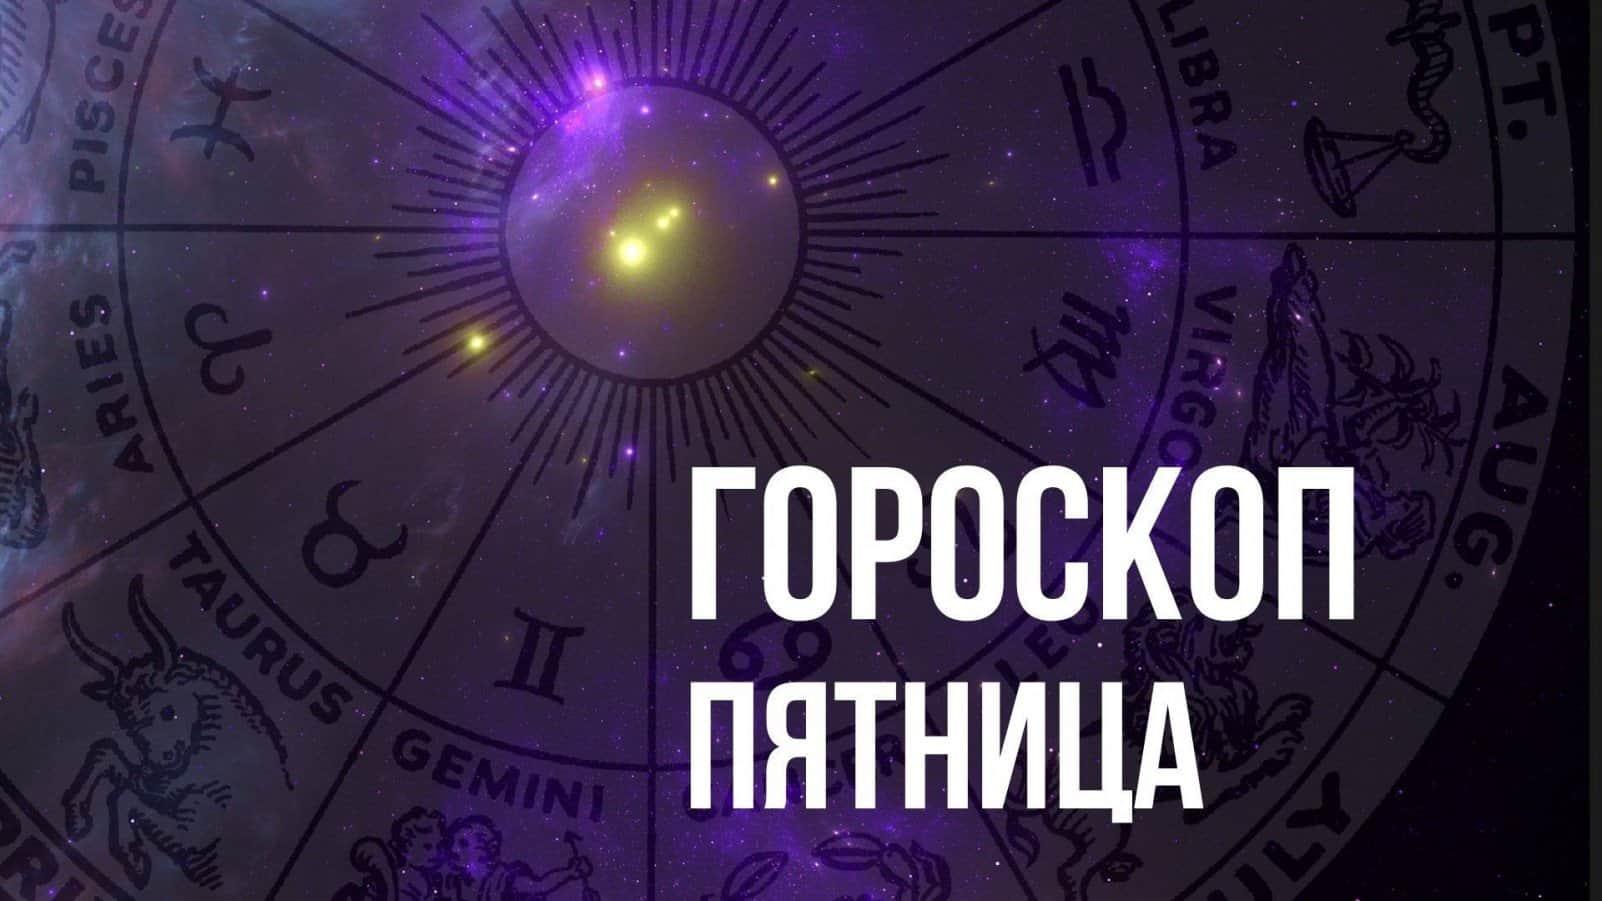 Гороскоп на пятницу 28 мая для каждого знака Зодиака